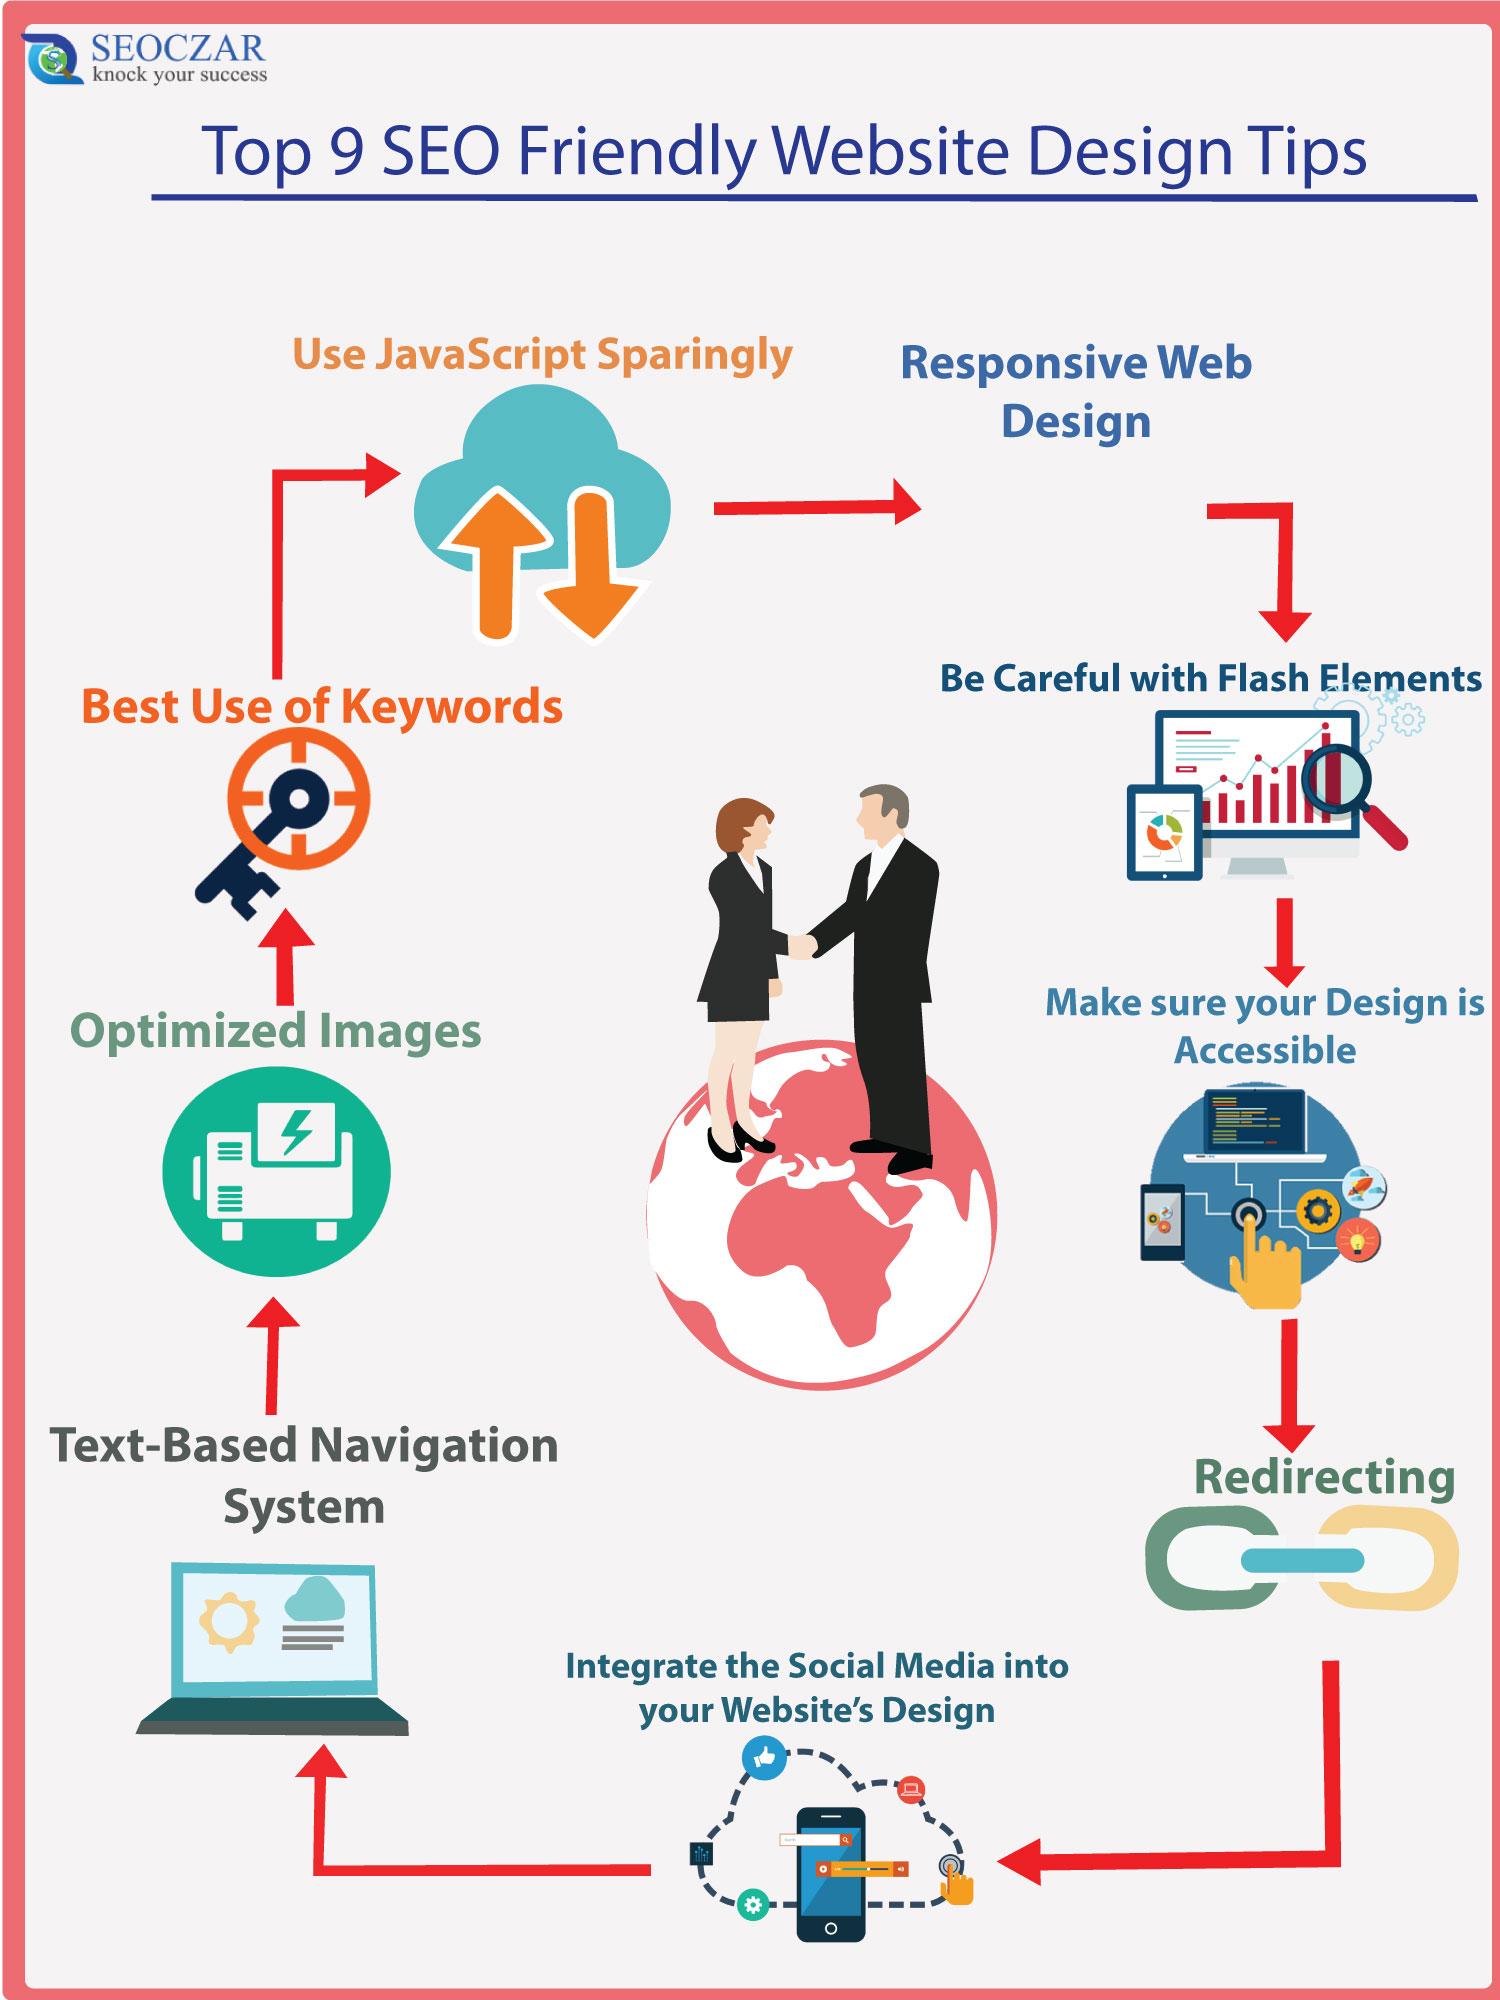 Top 9 SEO friendly website design tips